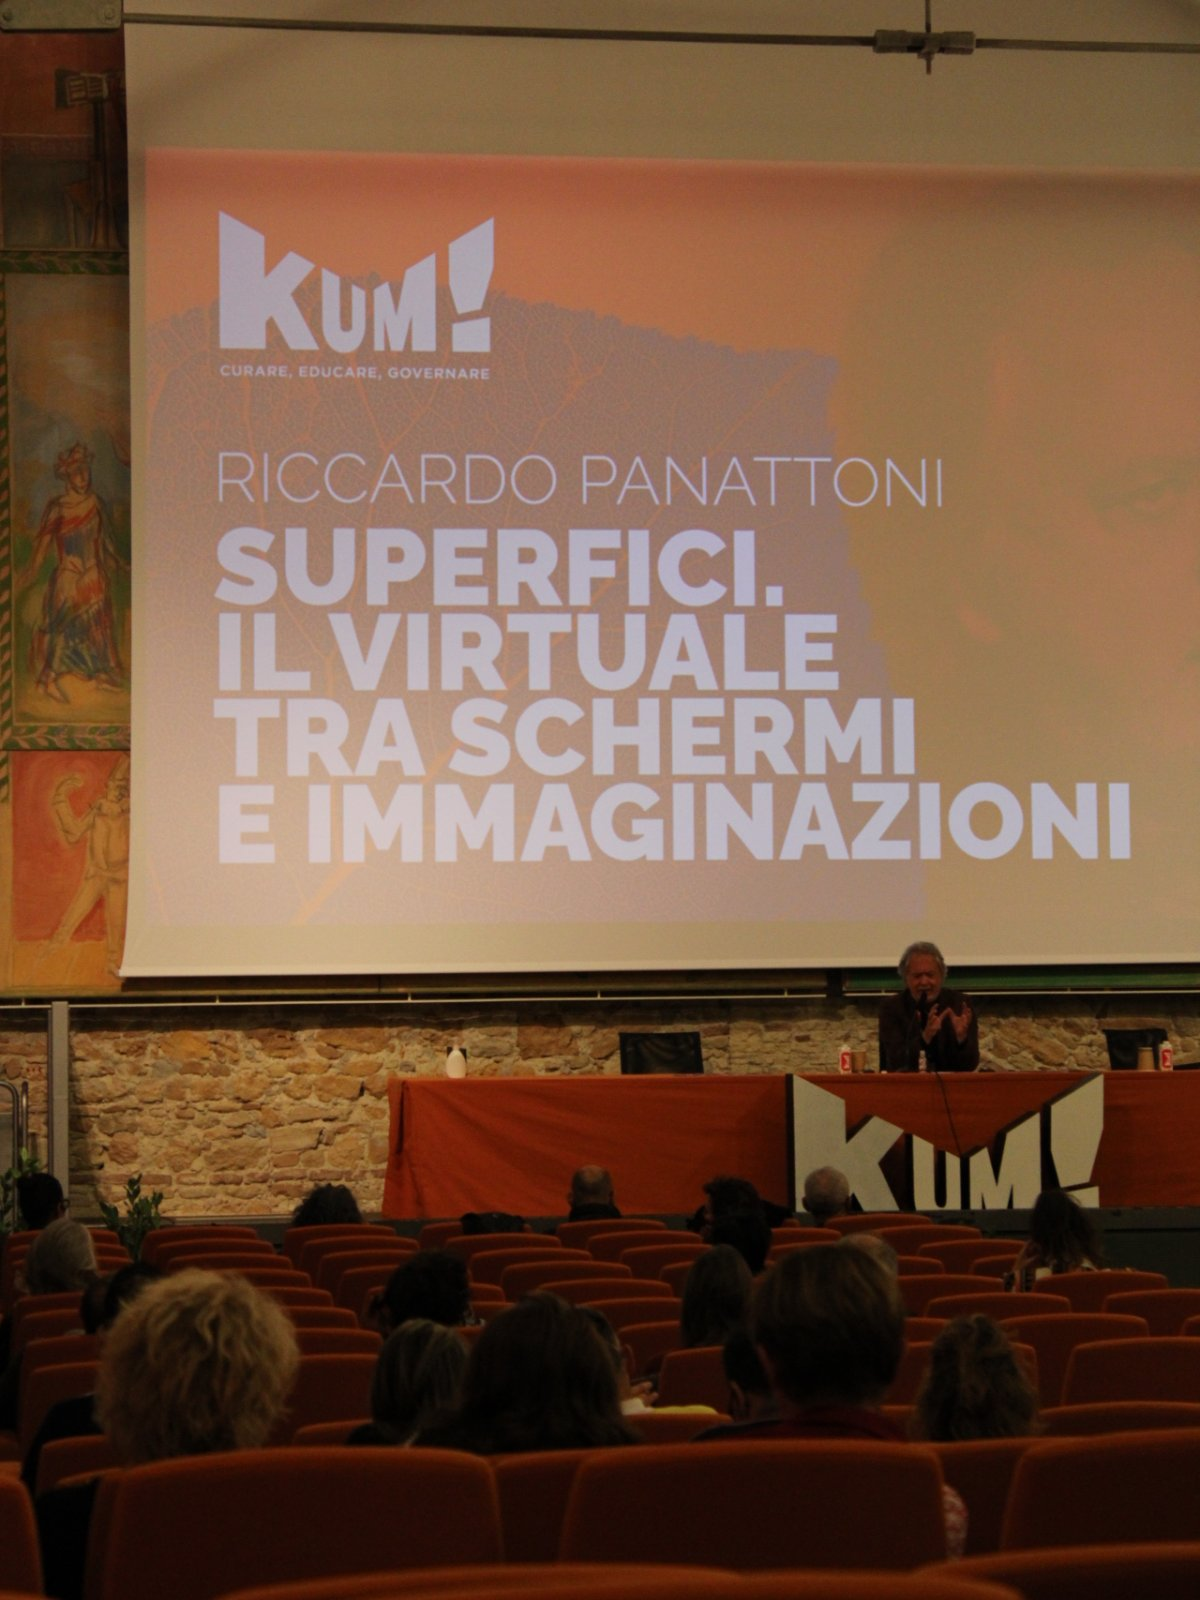 20201017_Riccardo_Panattoni_KUM20